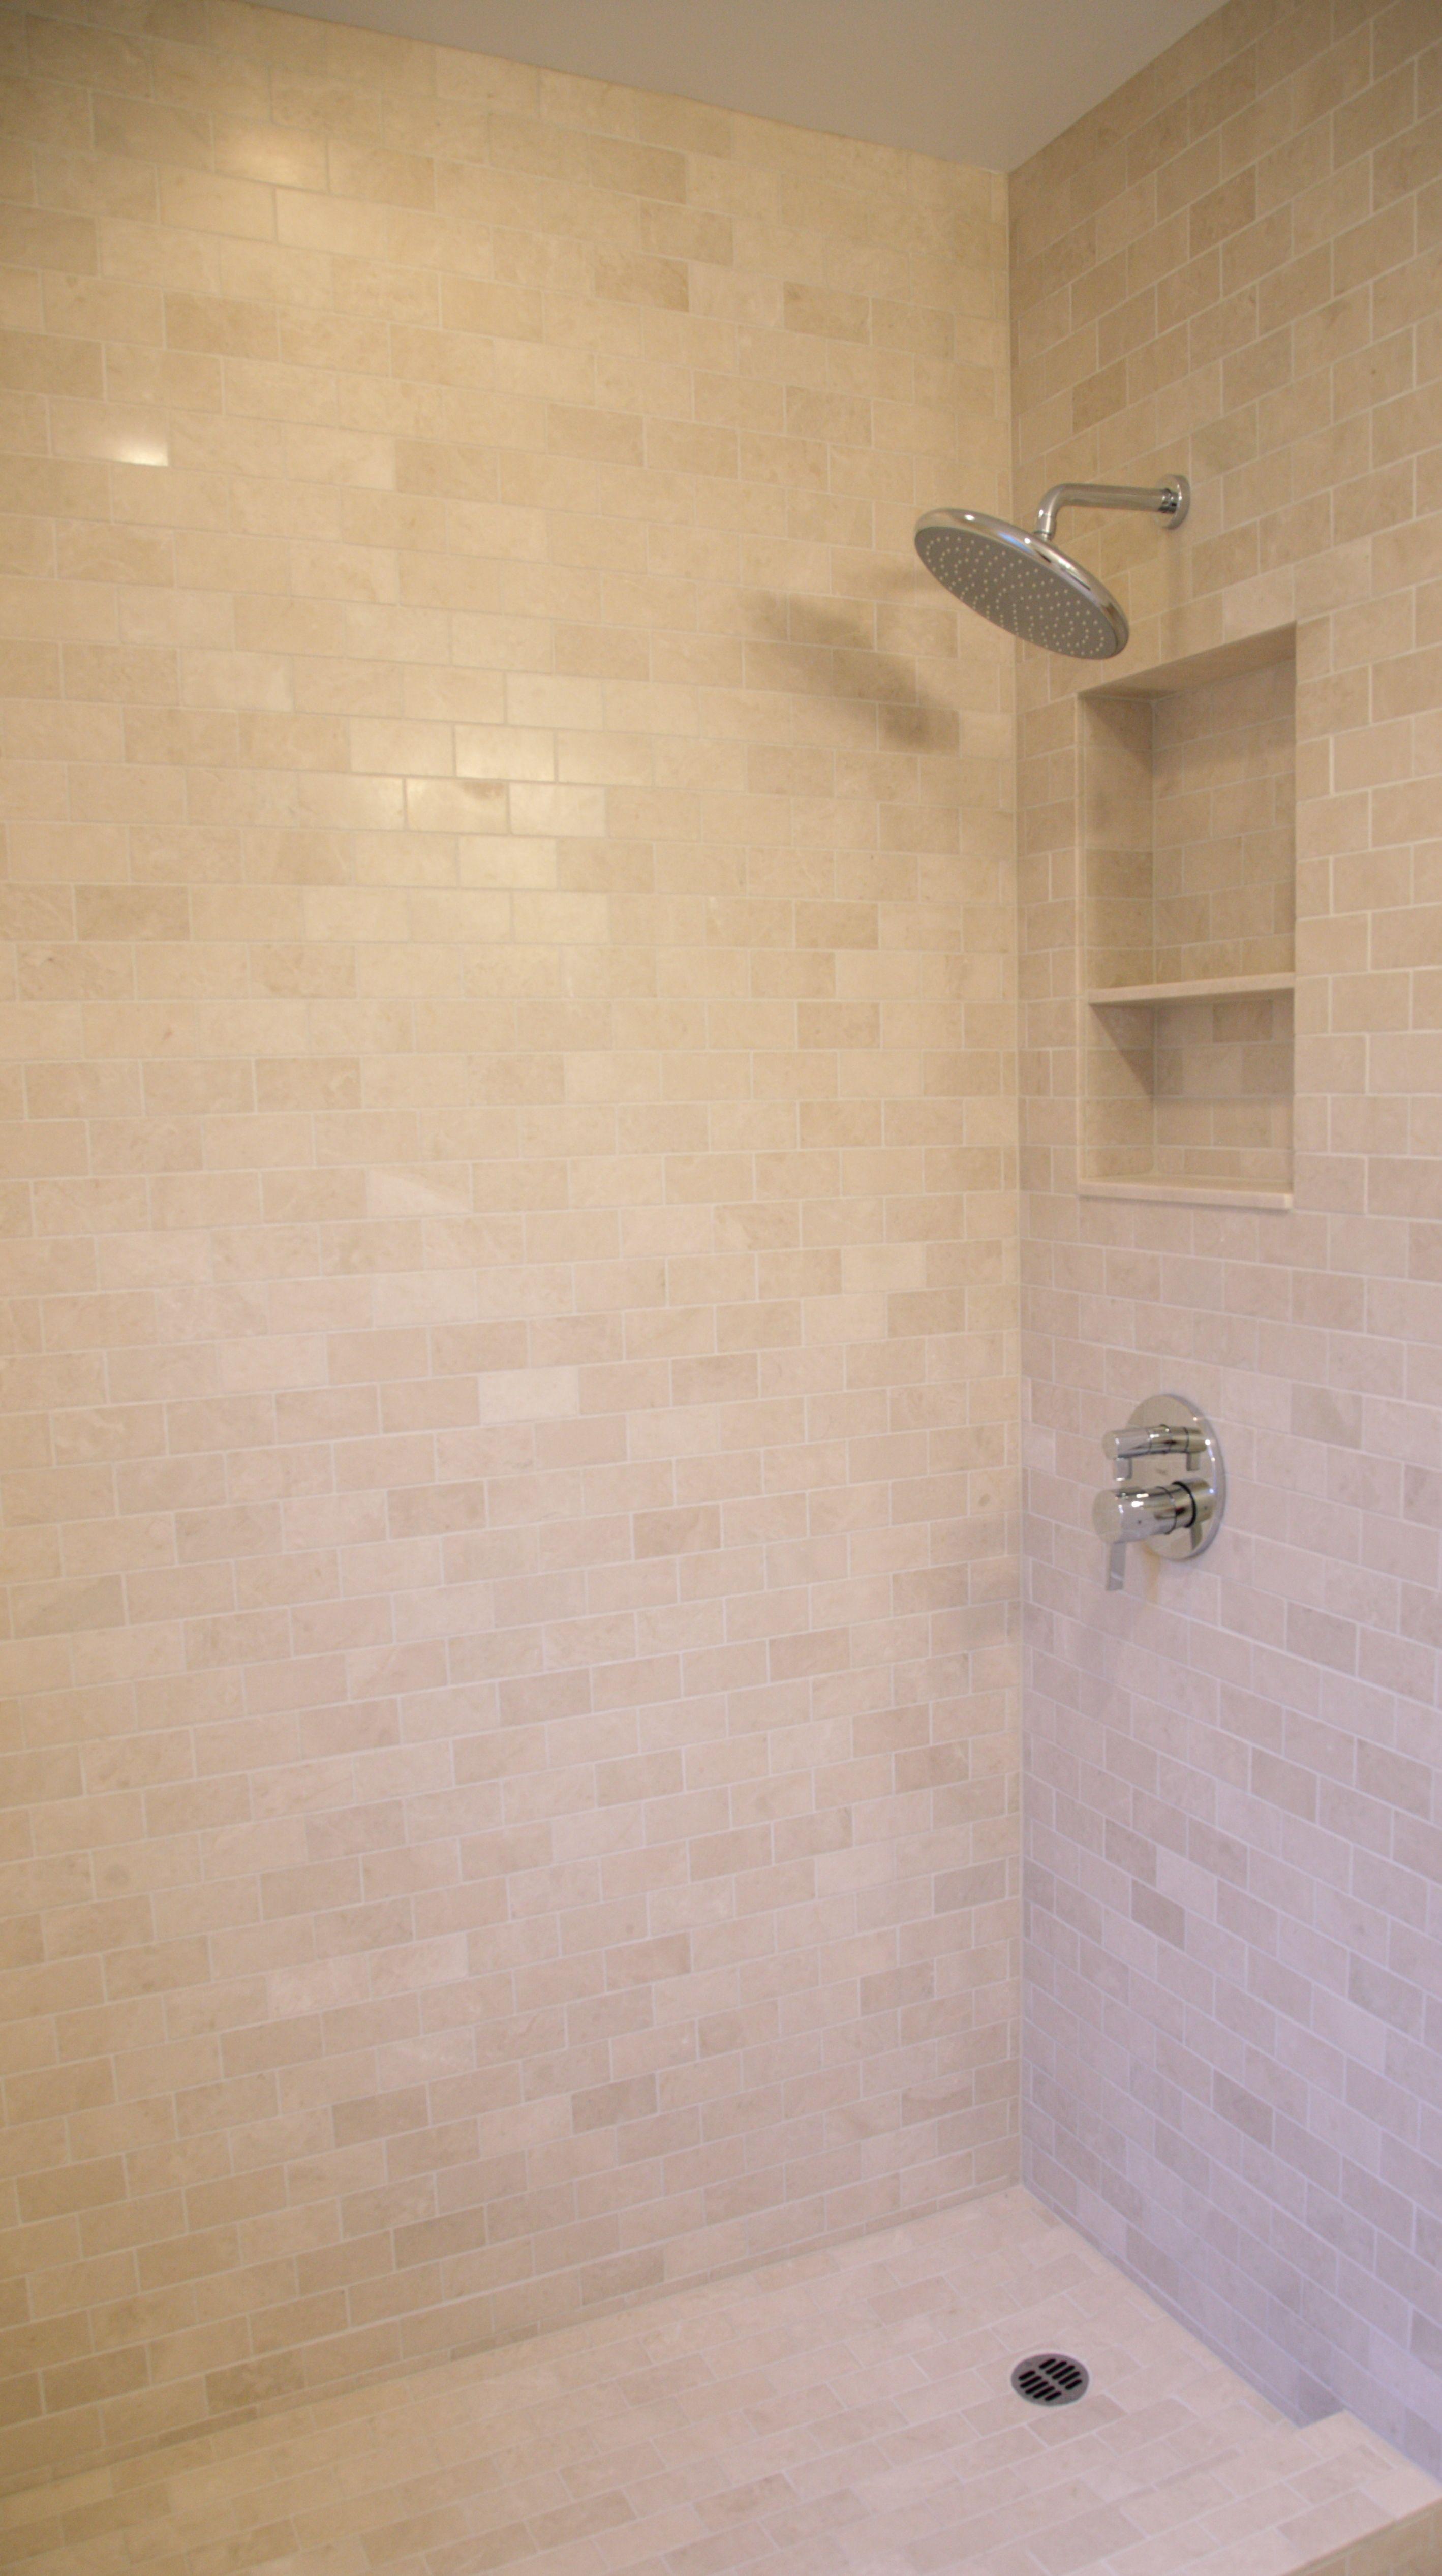 Crema Ella Agora S Beloved Soft Cream Color Marble Here In A Shower Installation In 3 X 6 Subway Tile Form Cream Tile Bathroom Bathroom Colors Tile Bathroom